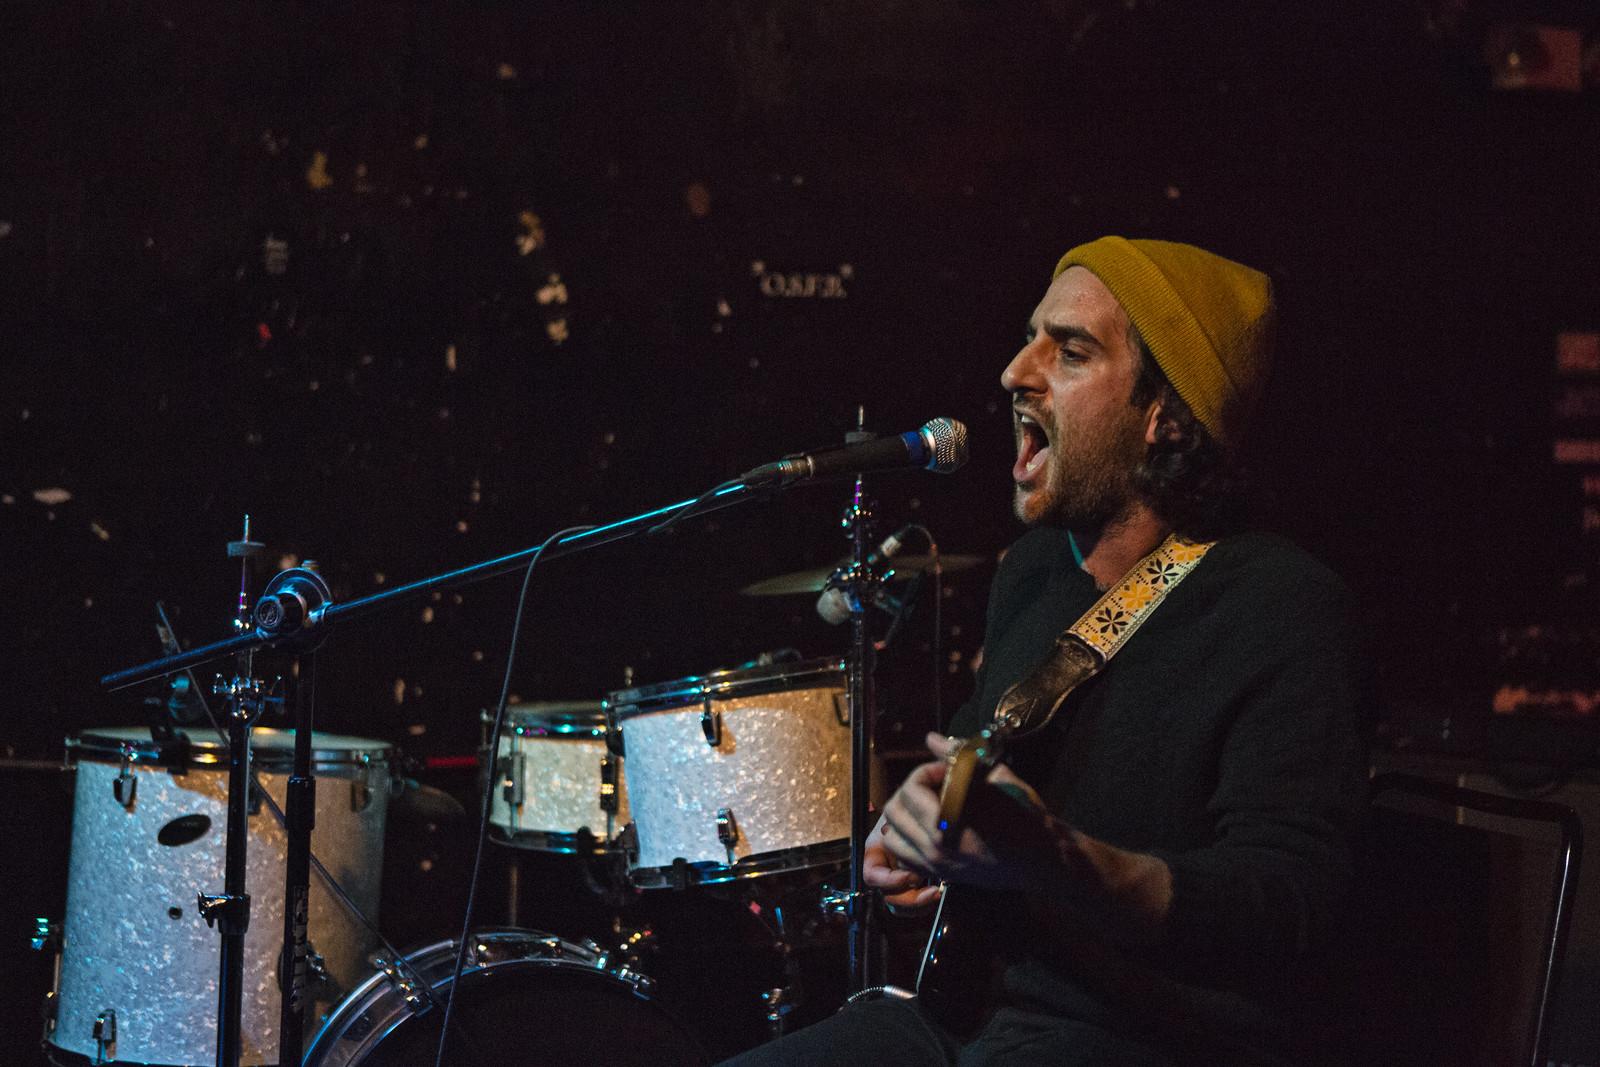 Max Holmquist @ The Zoo Bar | 11.16.15